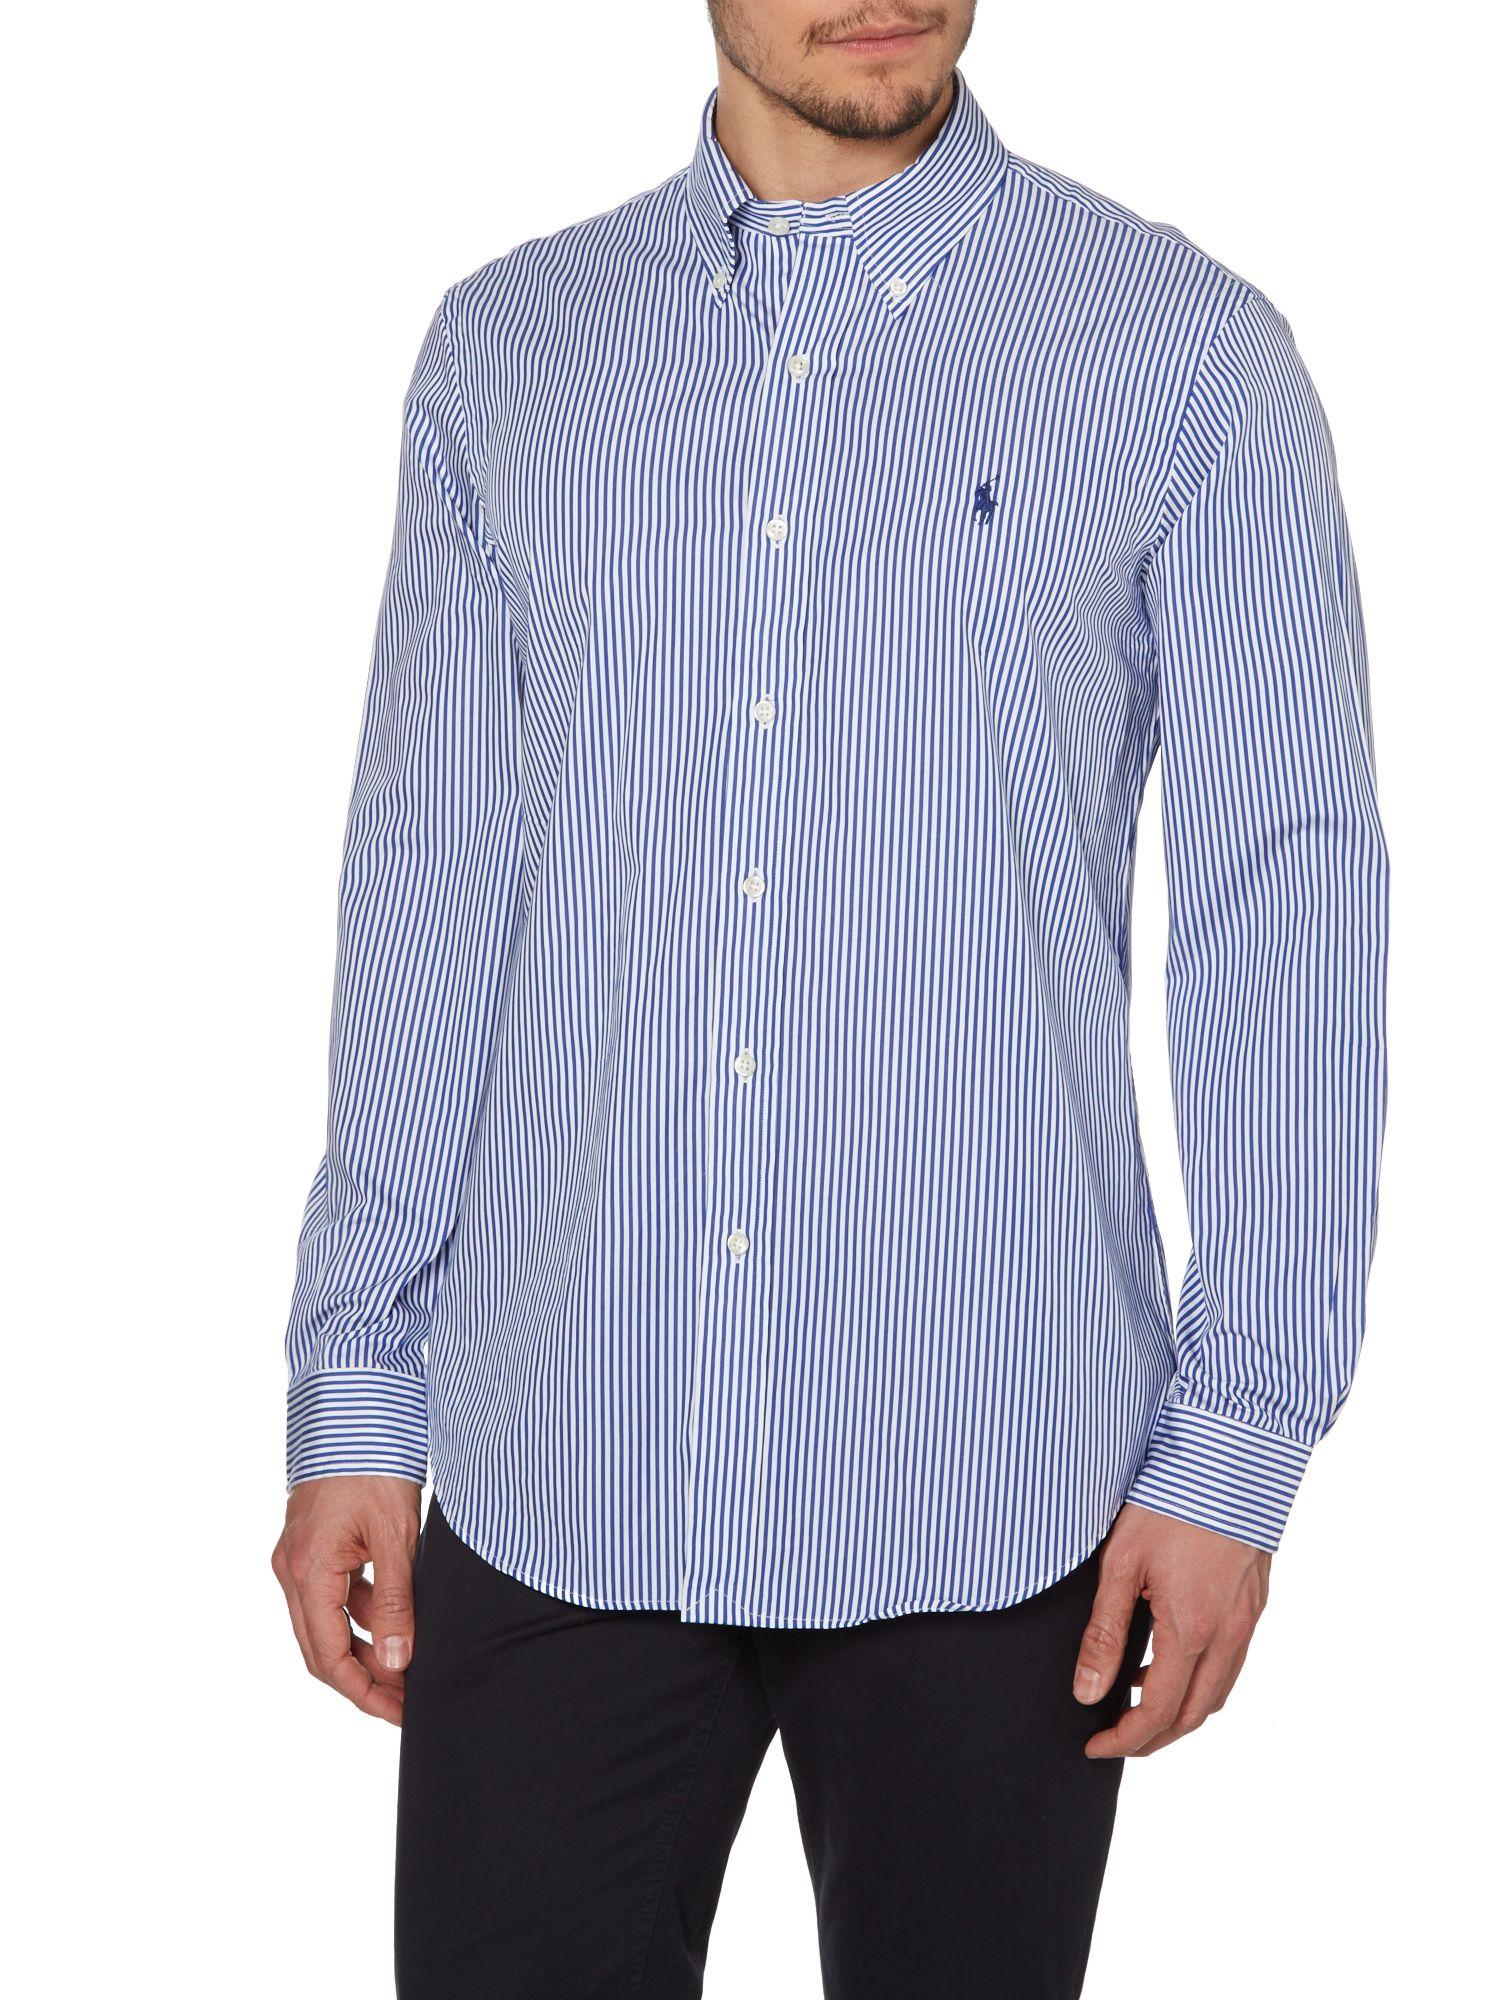 Polo Ralph Lauren Long Sleeve Button Down Collar Shirt In